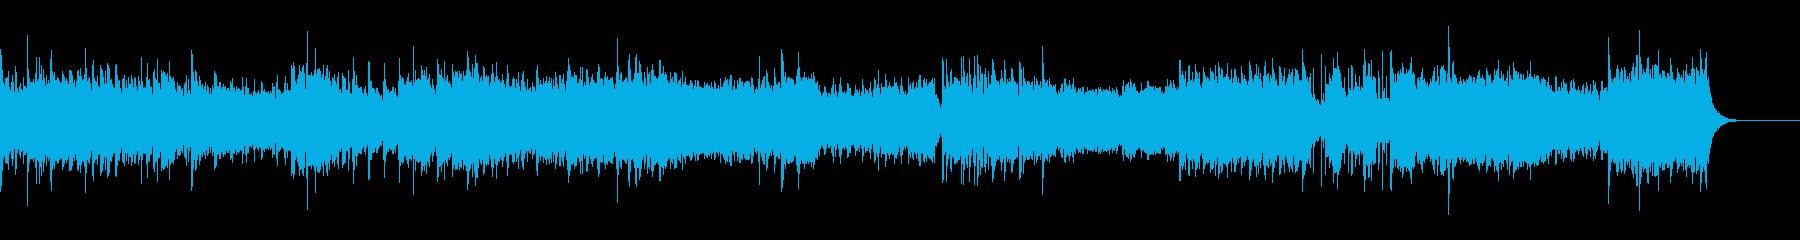 UFOドキュメンタリー番組のBGMの再生済みの波形